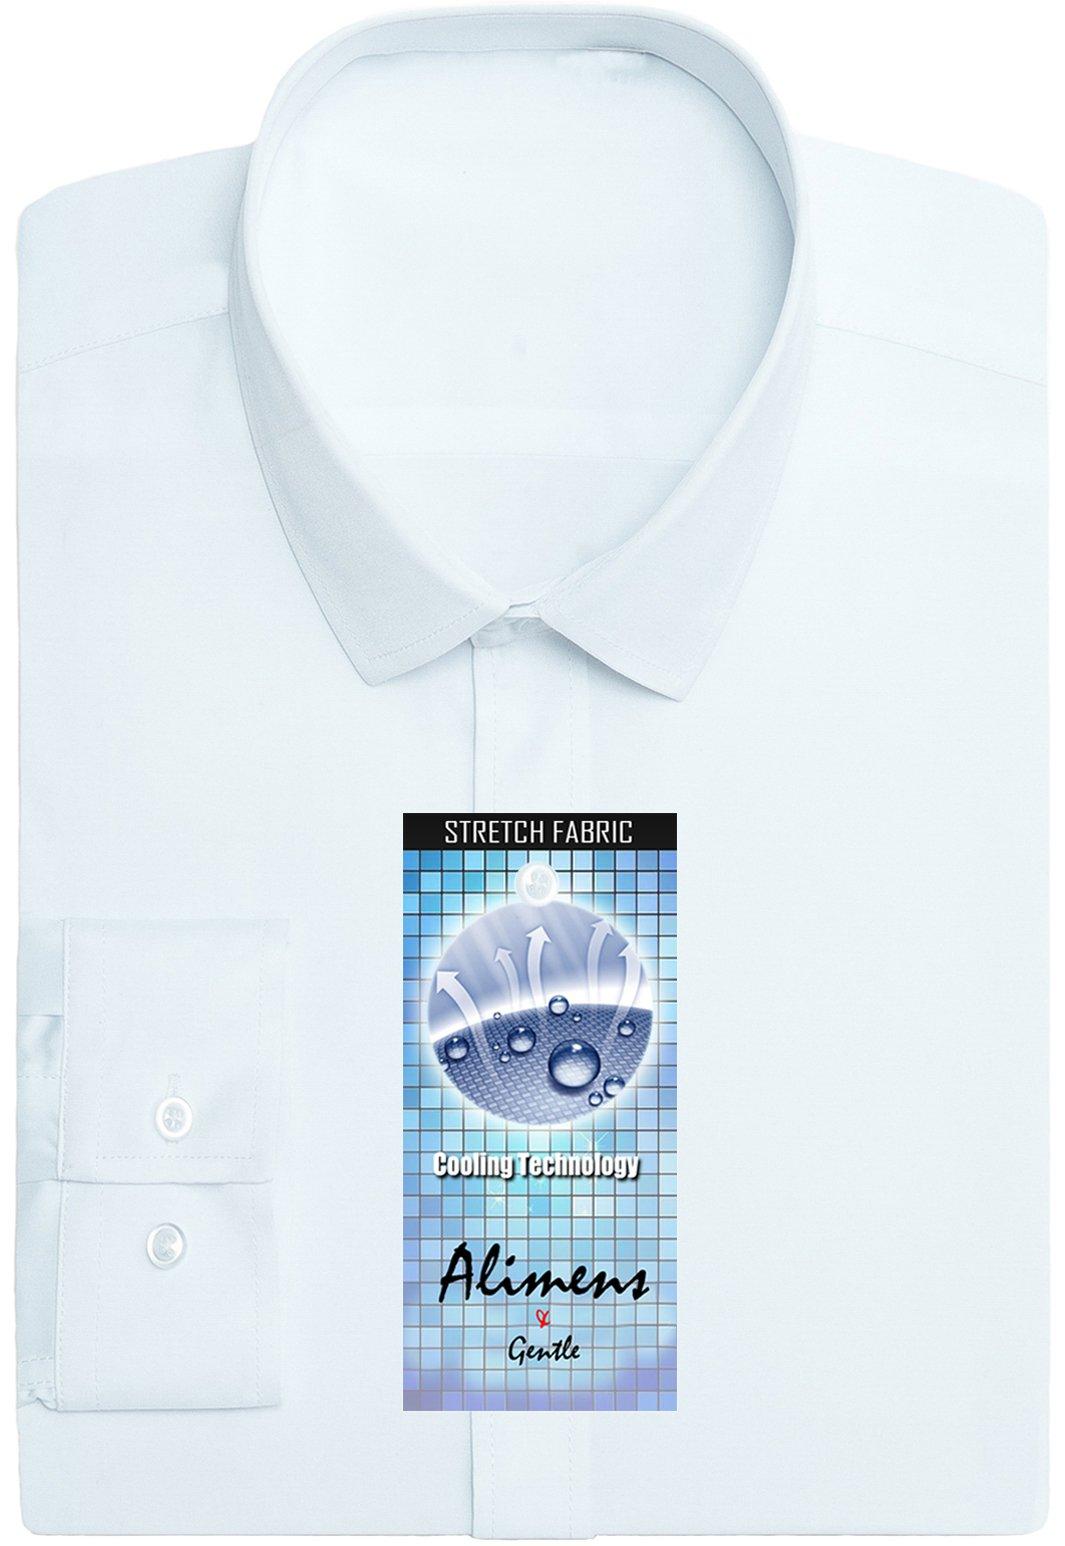 Alimens & Gentle Men's Poplin Elastic Long Sleeve Bussiness Dress Shirts - Color: White, Size: 17.5'' Neck - 34''/35'' Sleeve